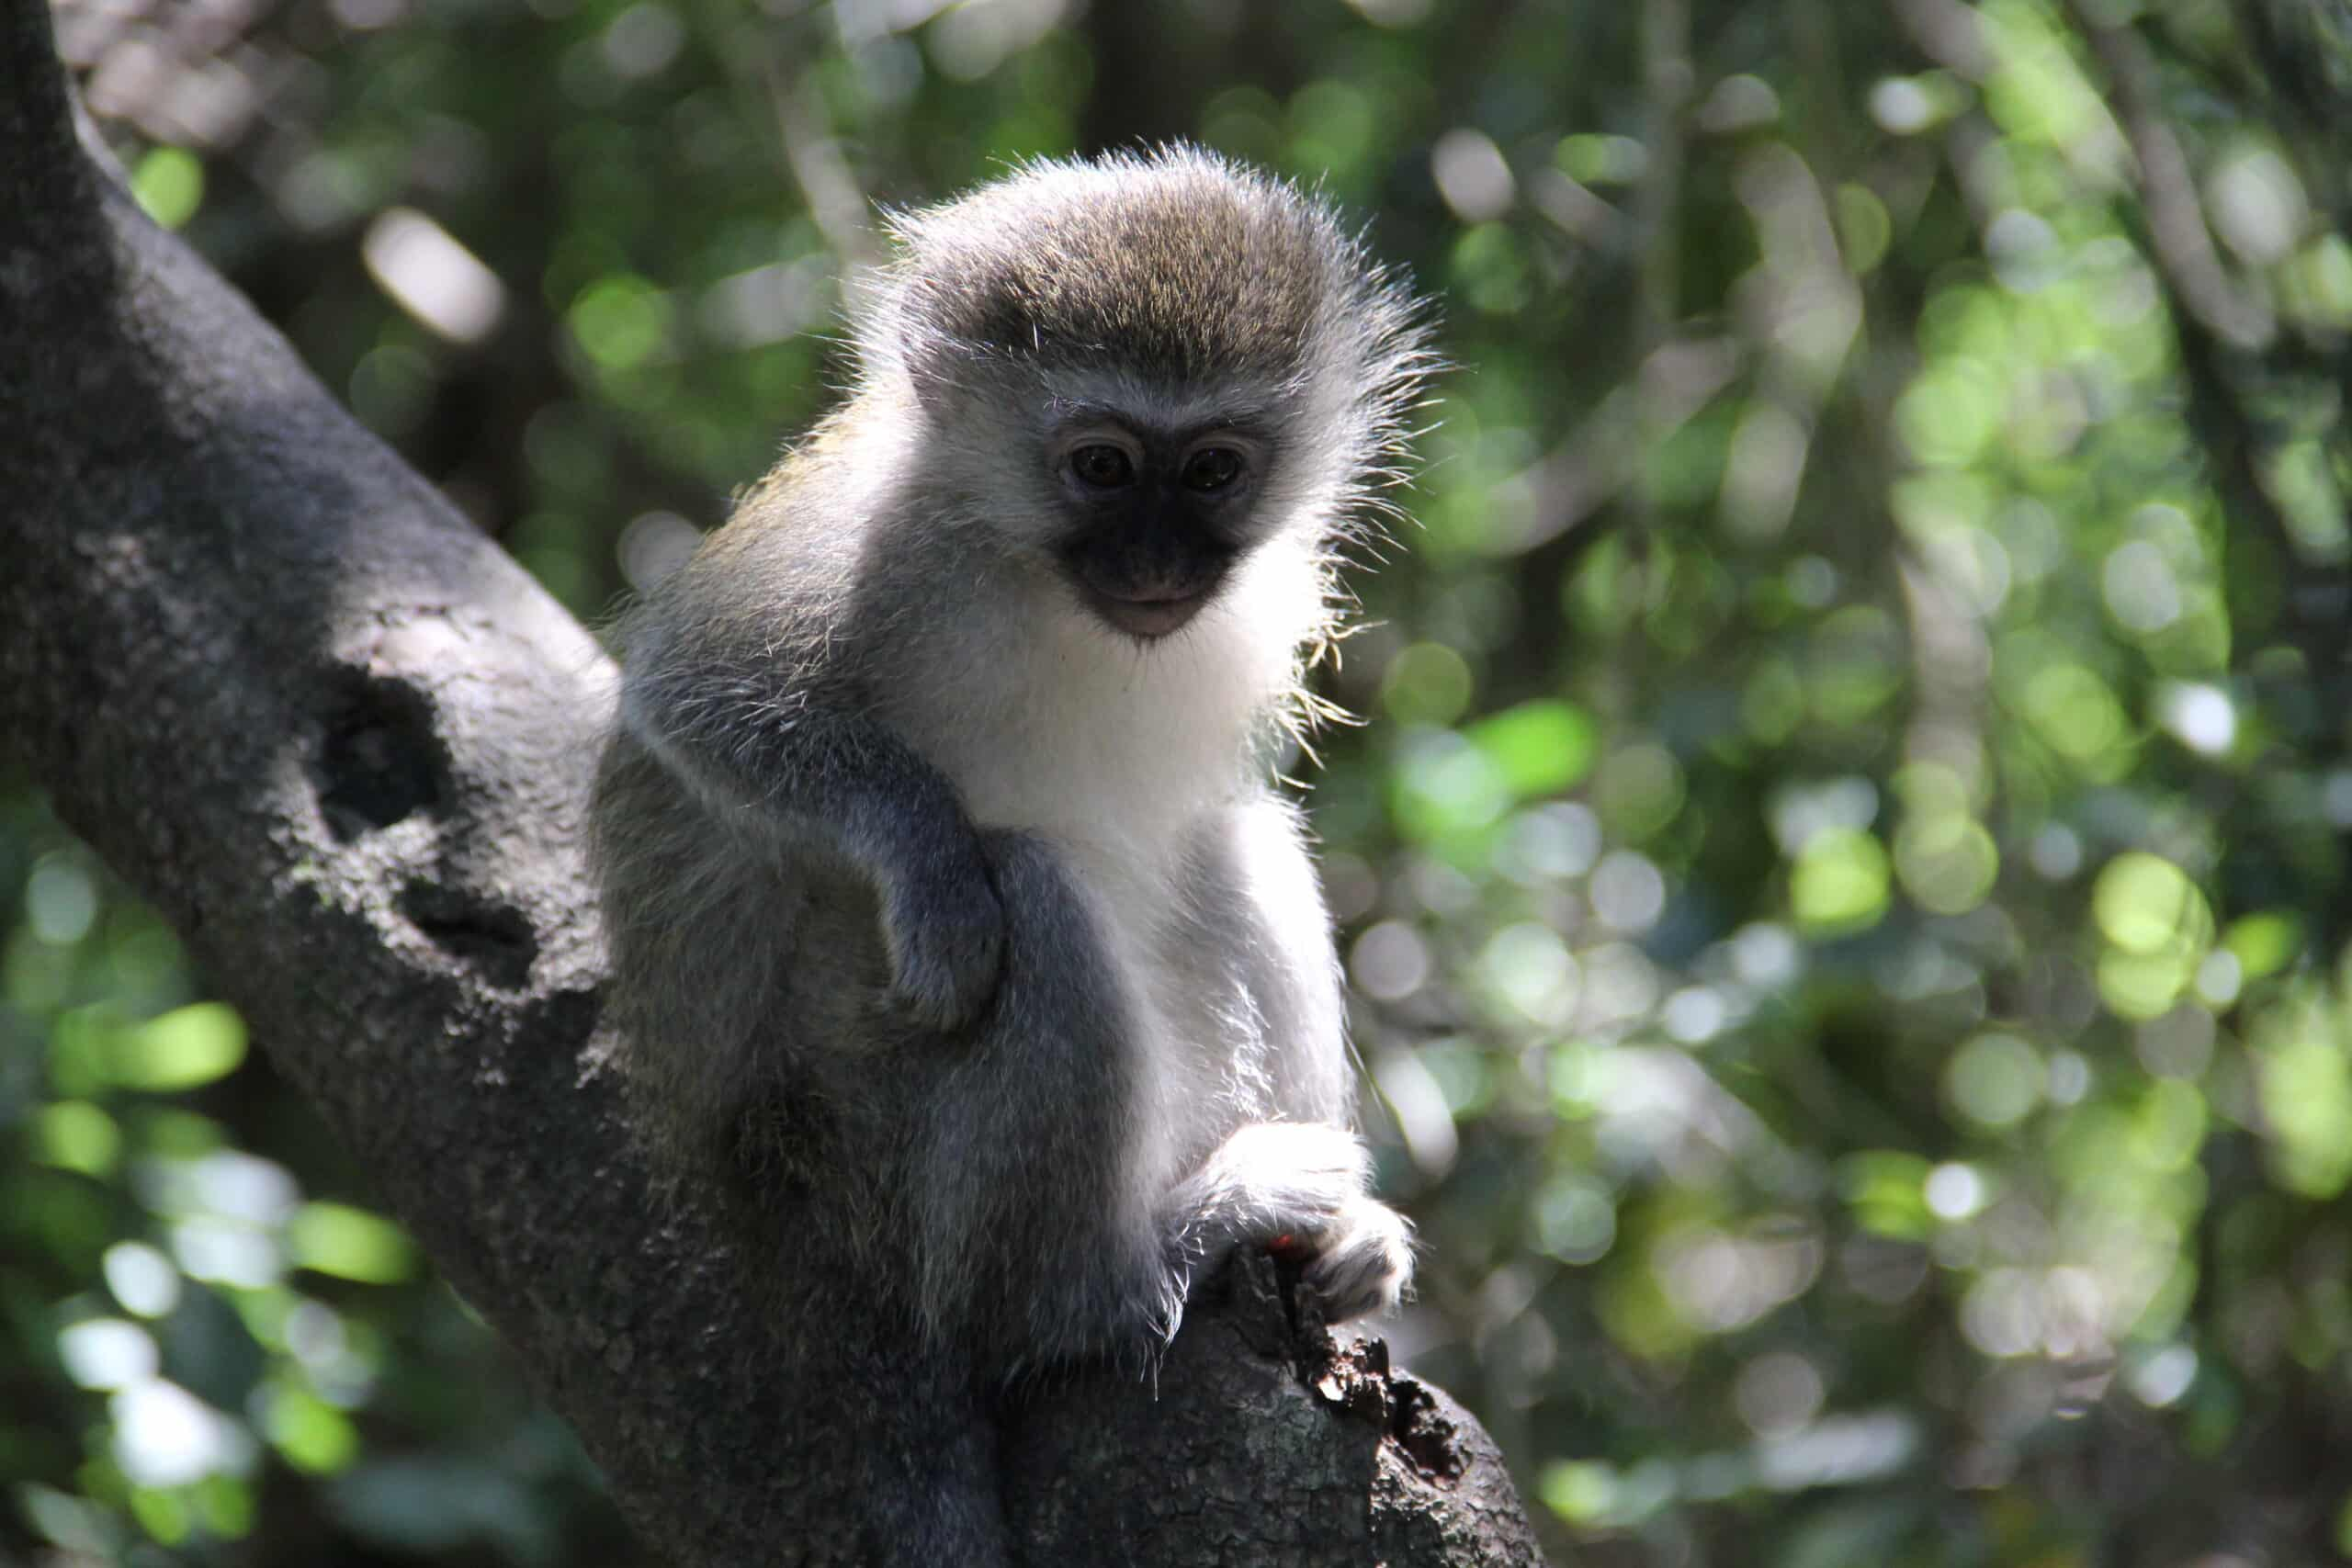 Macaco da reserva ambiental em Plettenberg Bay